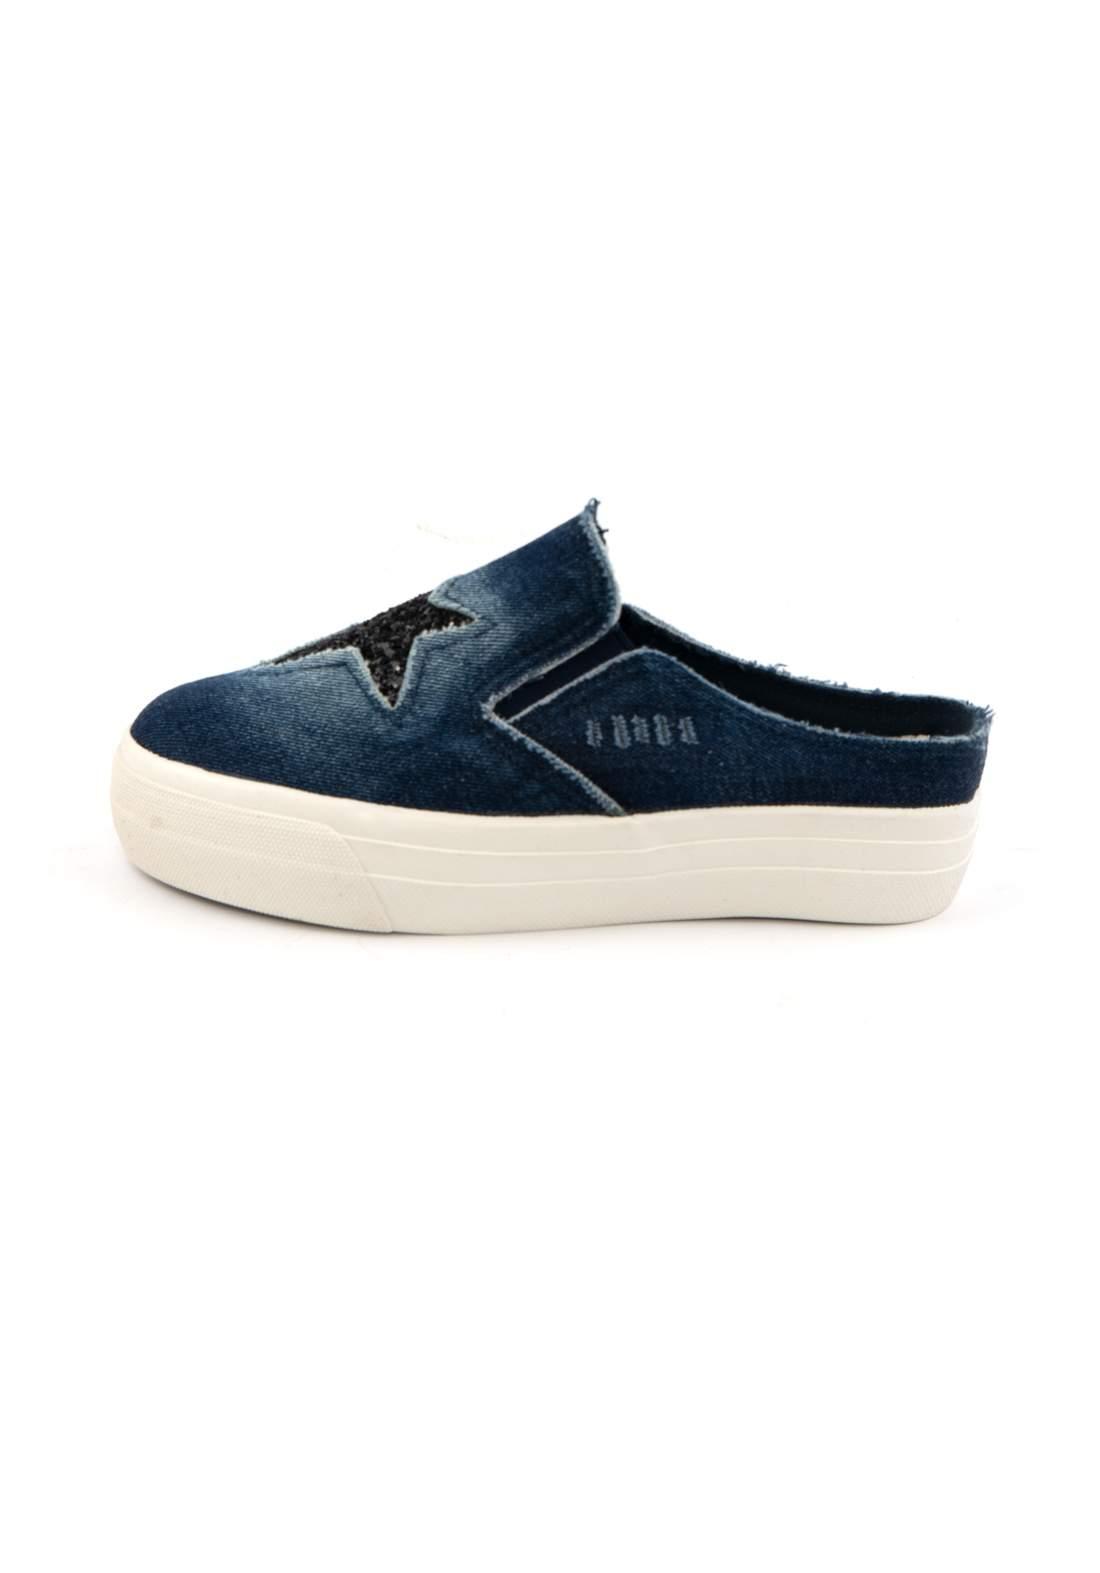 حذاء نسائي رياضي جينز نيلي اللون